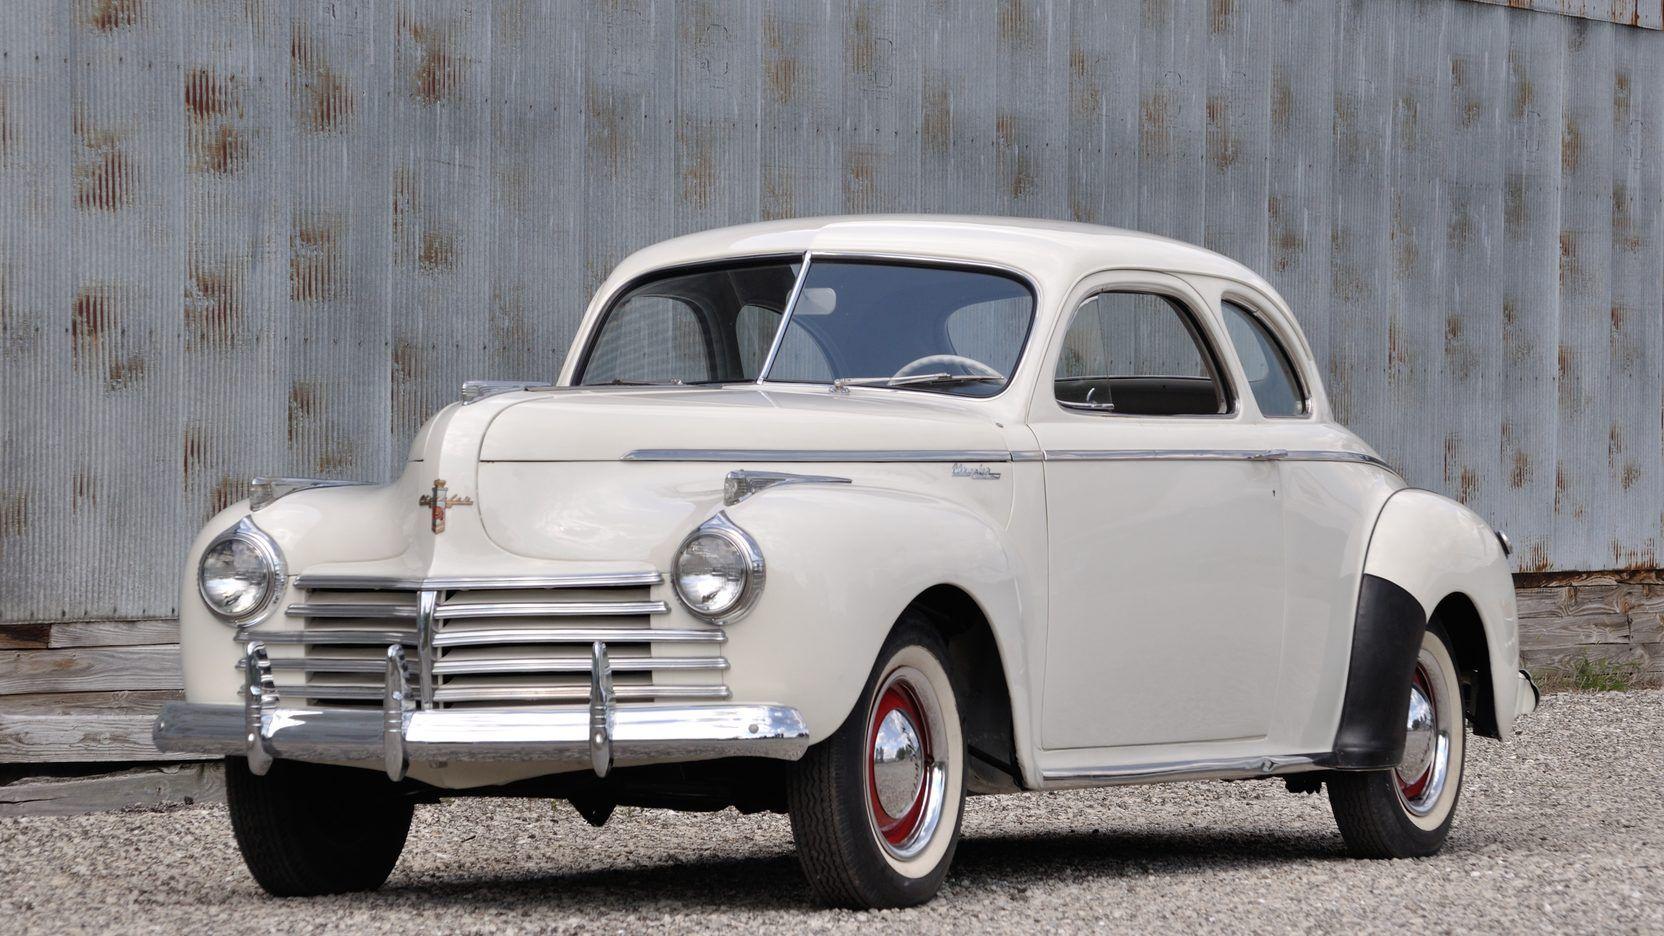 1941 Chrysler Windsor | Classic Cars | Pinterest | Cars, Mopar and ...